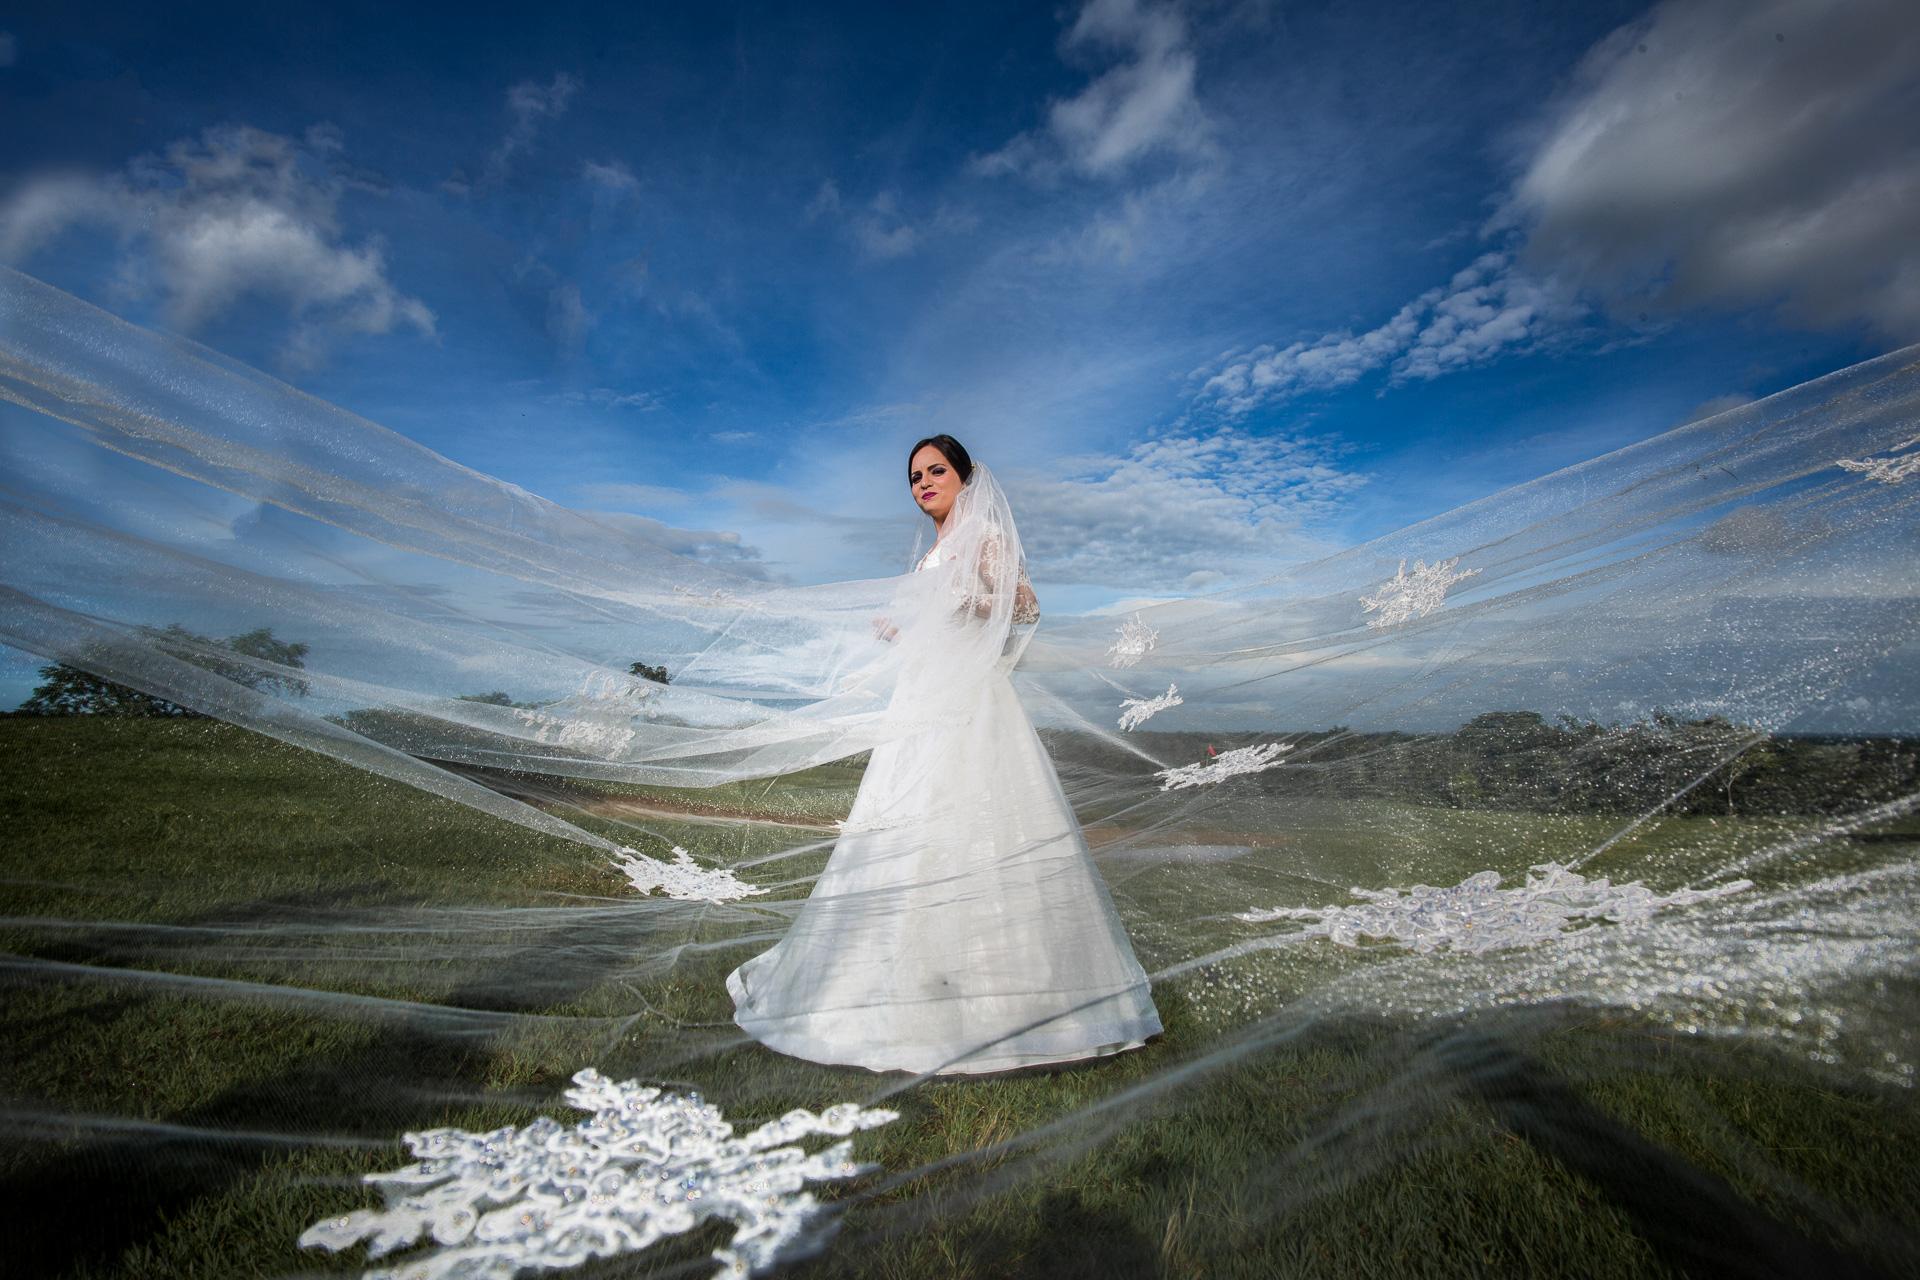 Fotógrafos-de-bodas-en-Colombia-Sthephanie-y-David-31 STEPHANIE + DAVID